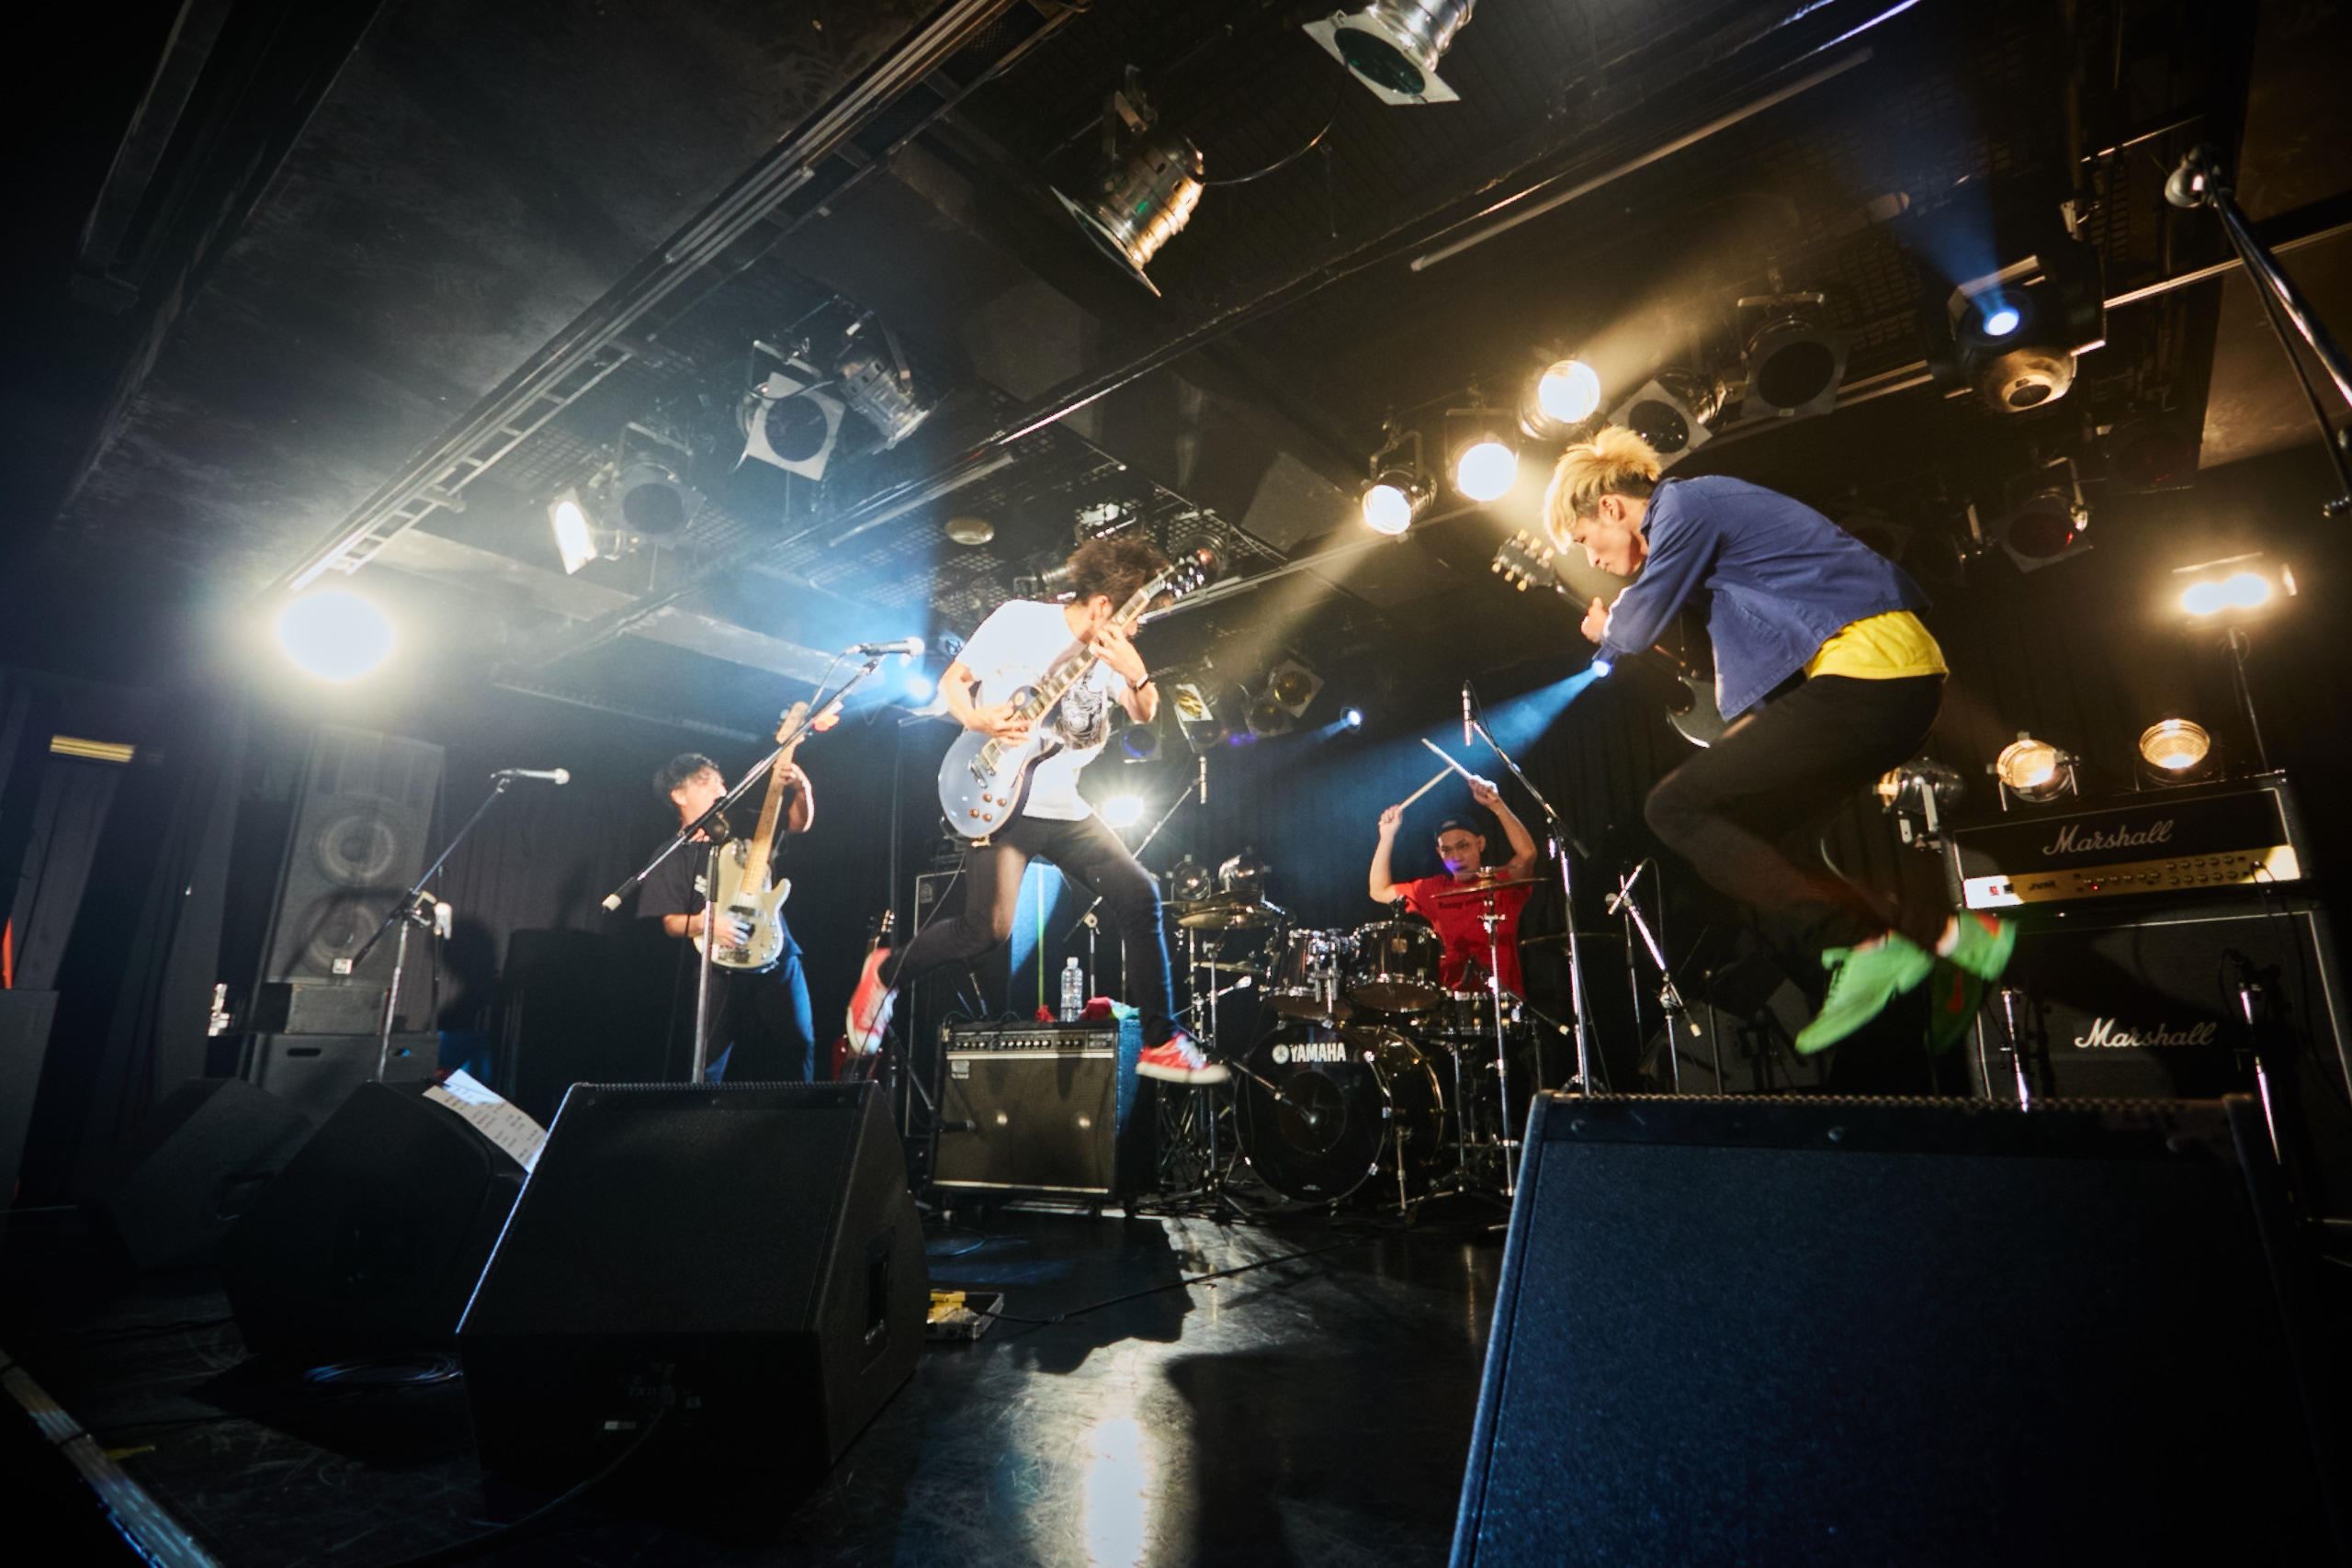 http://news.yoshimoto.co.jp/20171006004148-35c03301b912a80aee9a7f4c5cfd0c6aee63c5f4.jpg